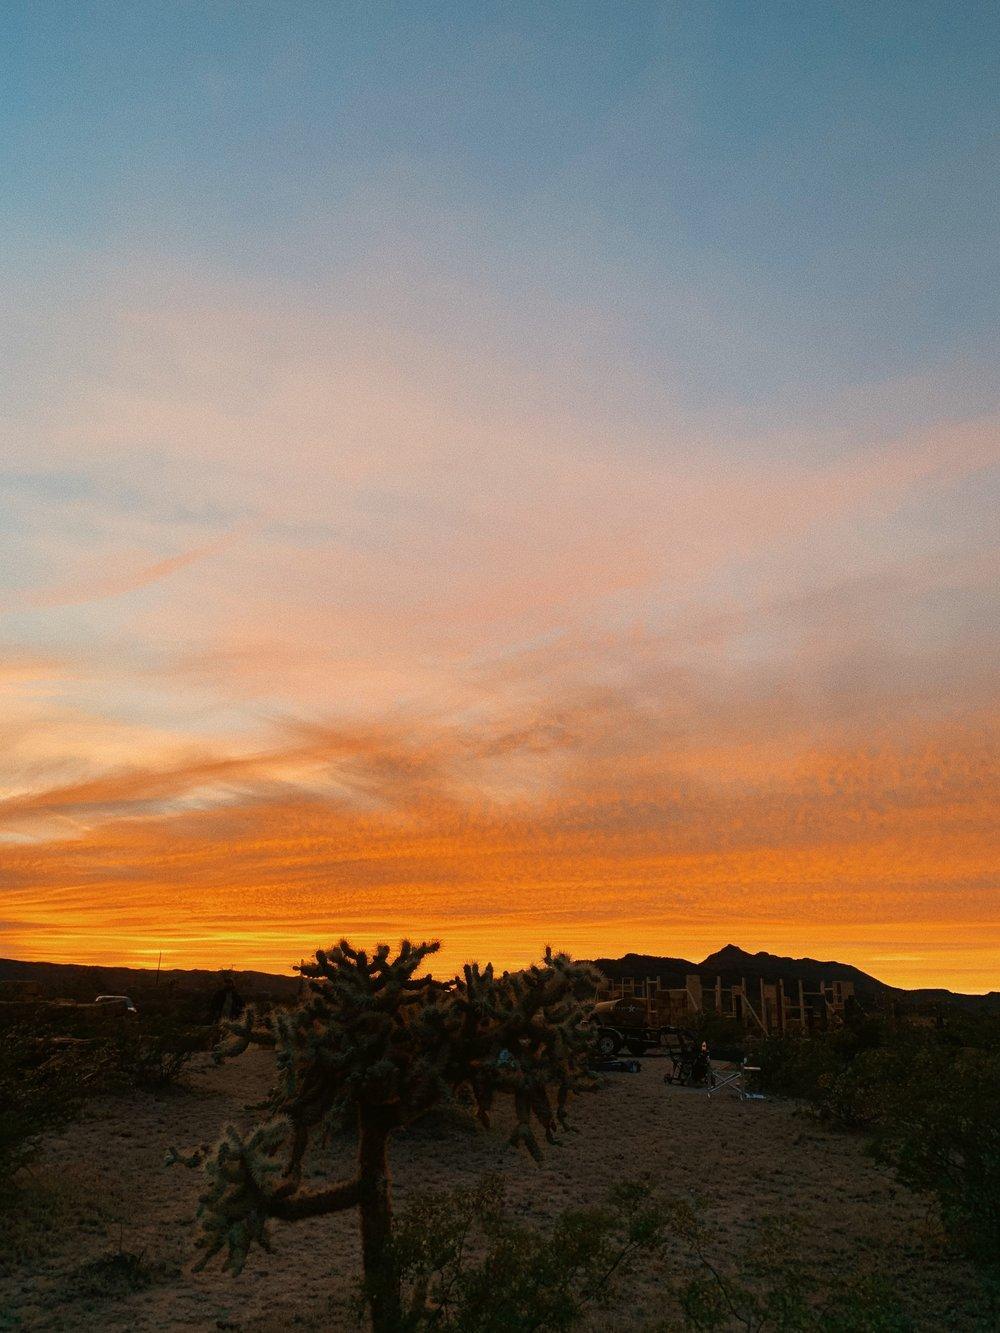 sunset, tohono o'odam nation, 2019